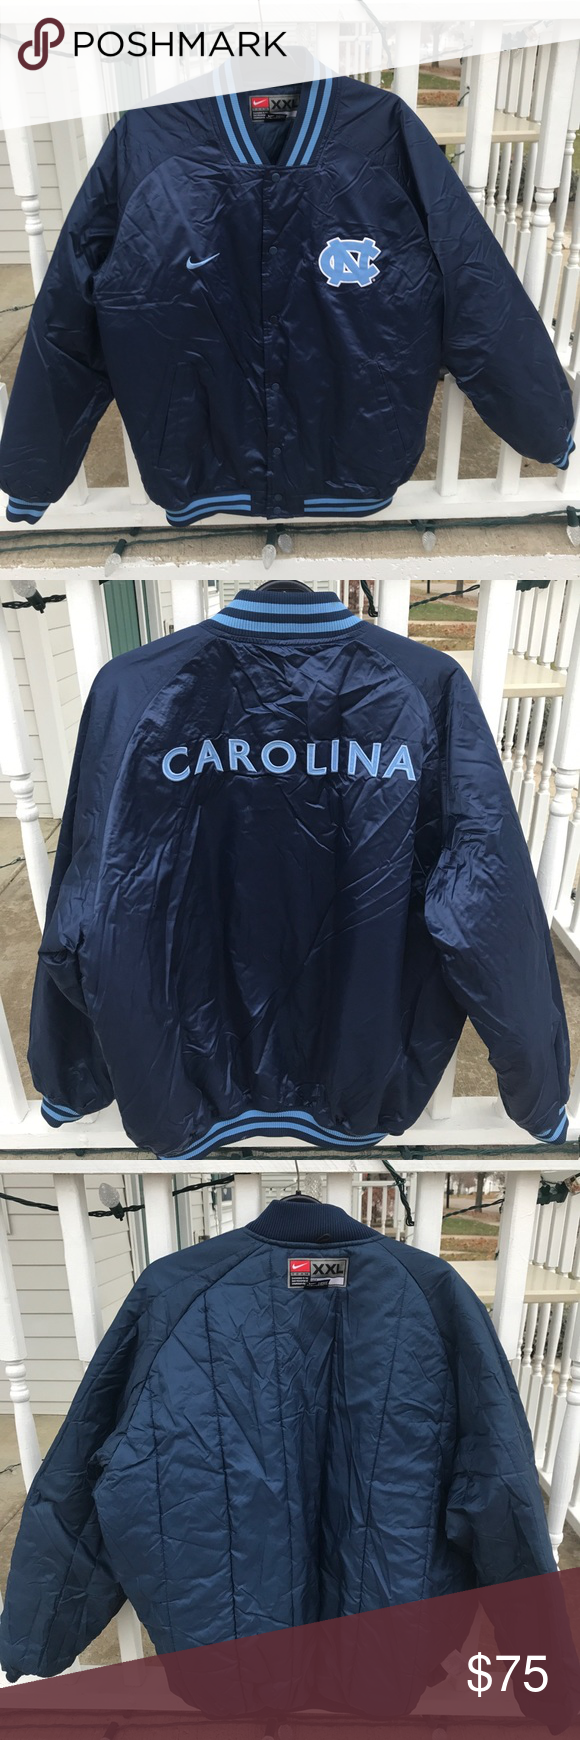 Nike North Carolina Tar Heels Bomber Satin Jacket Satin Jackets Jackets North Carolina Tar Heels [ 1740 x 580 Pixel ]